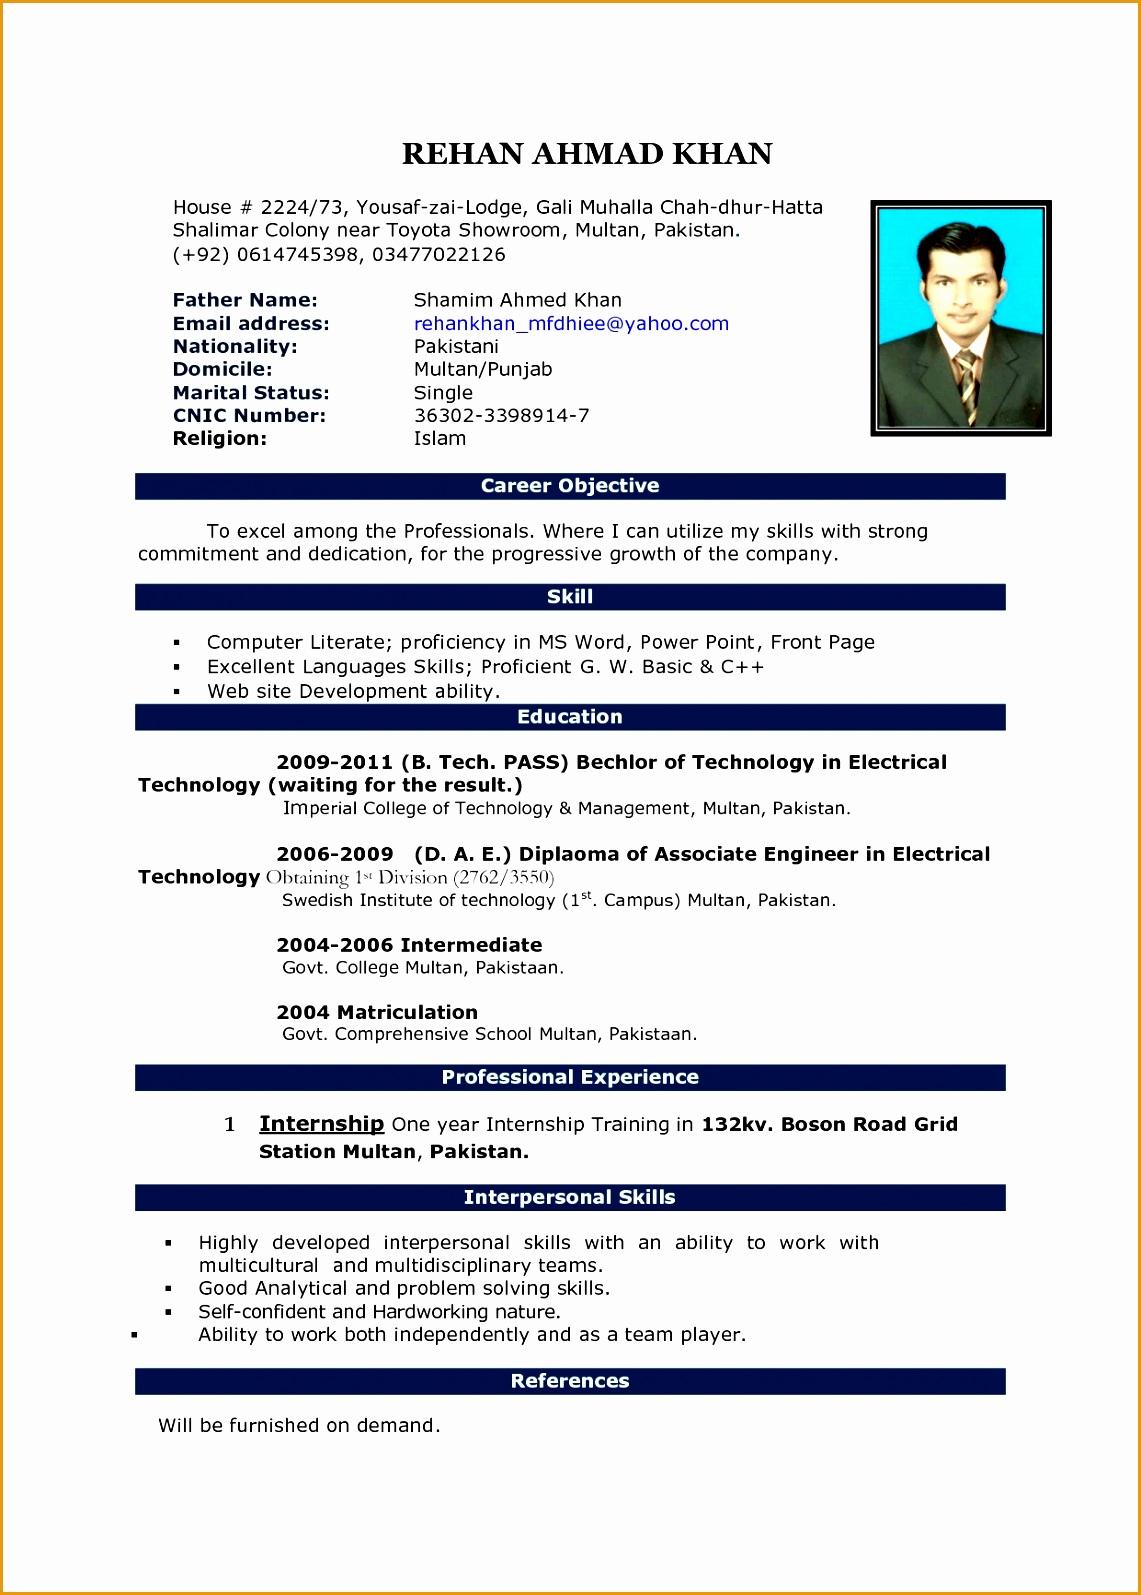 free printable resume builder resume examplefree resume builder with 85 charming resume templates word free15951141